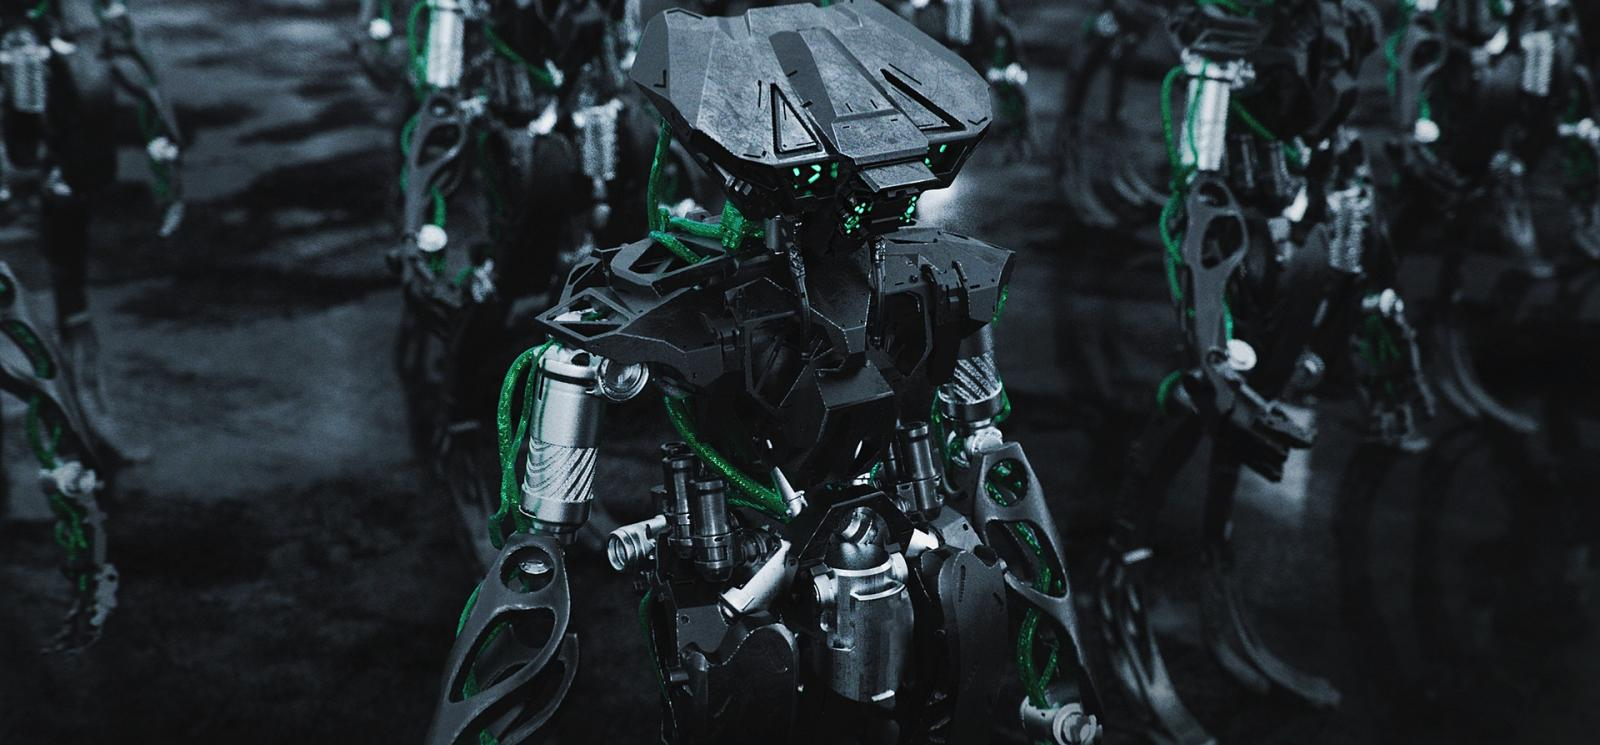 mousart-bad-robot-1-dot-0-5-e5180a1f-ef6p.jpg